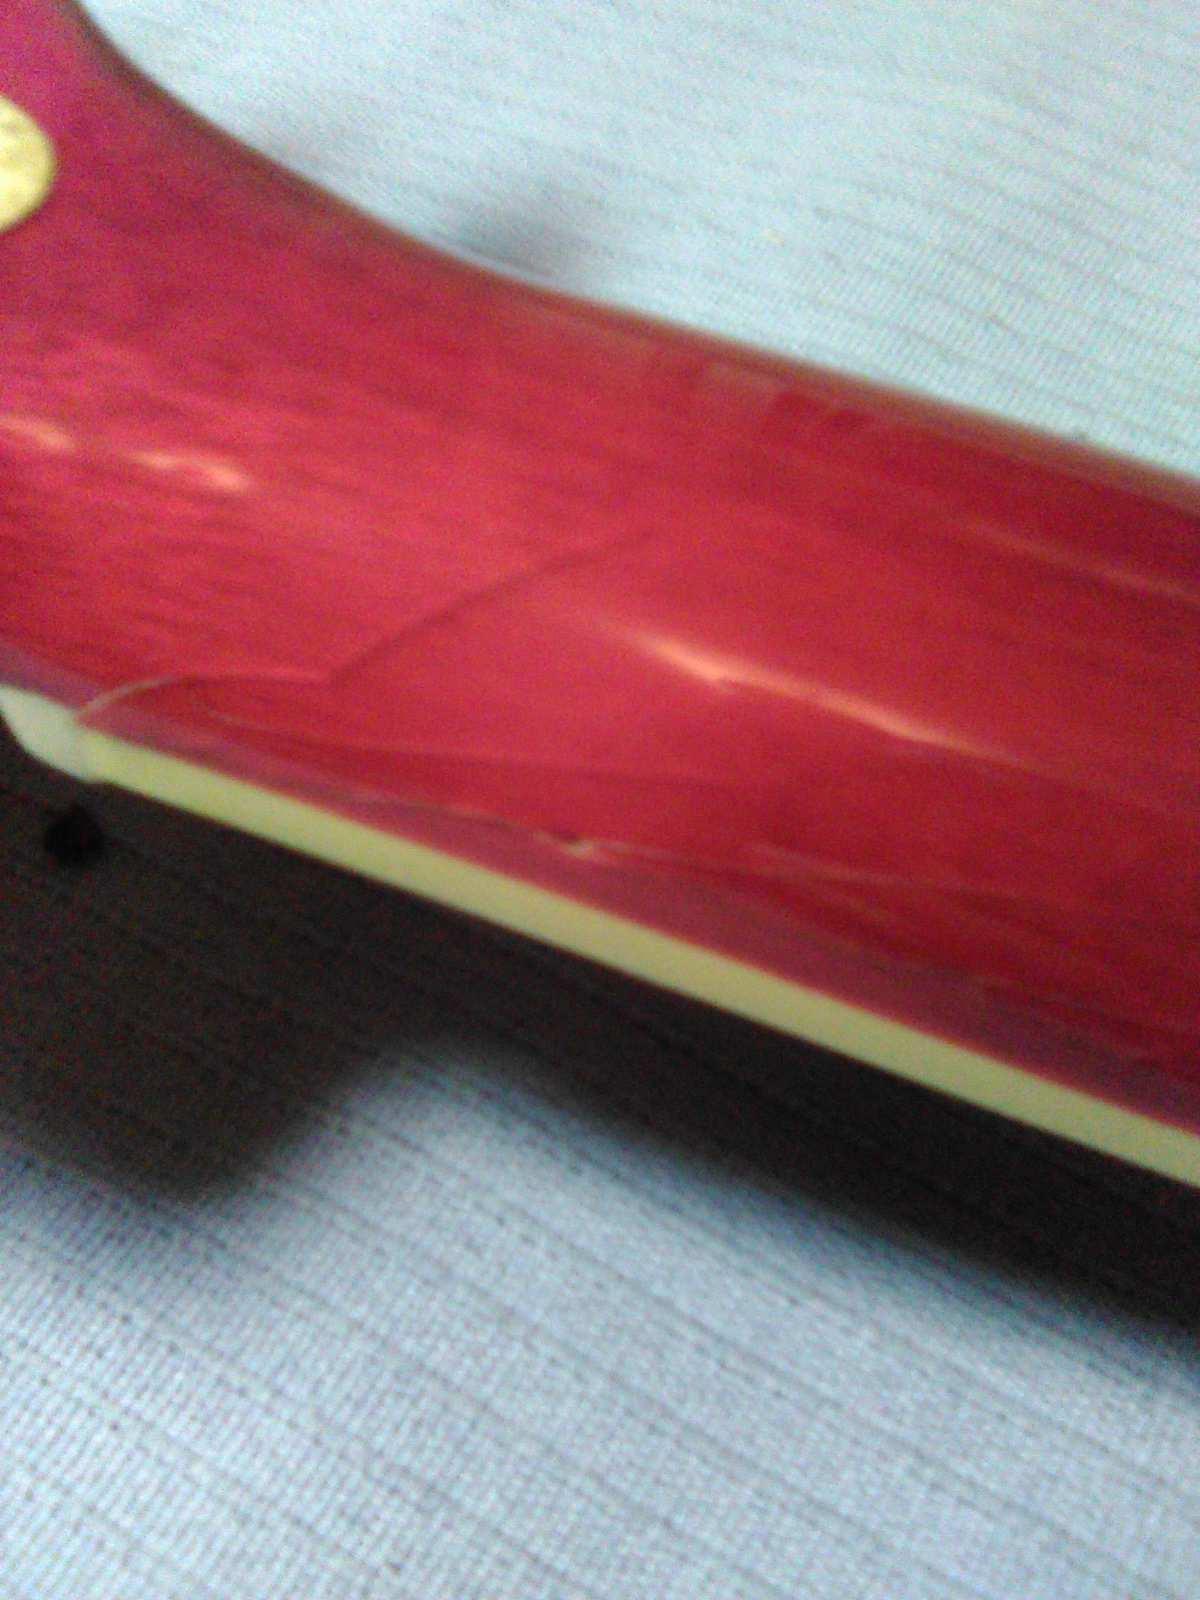 Respraying finish cracks in beater guitar-neck-2-jpg